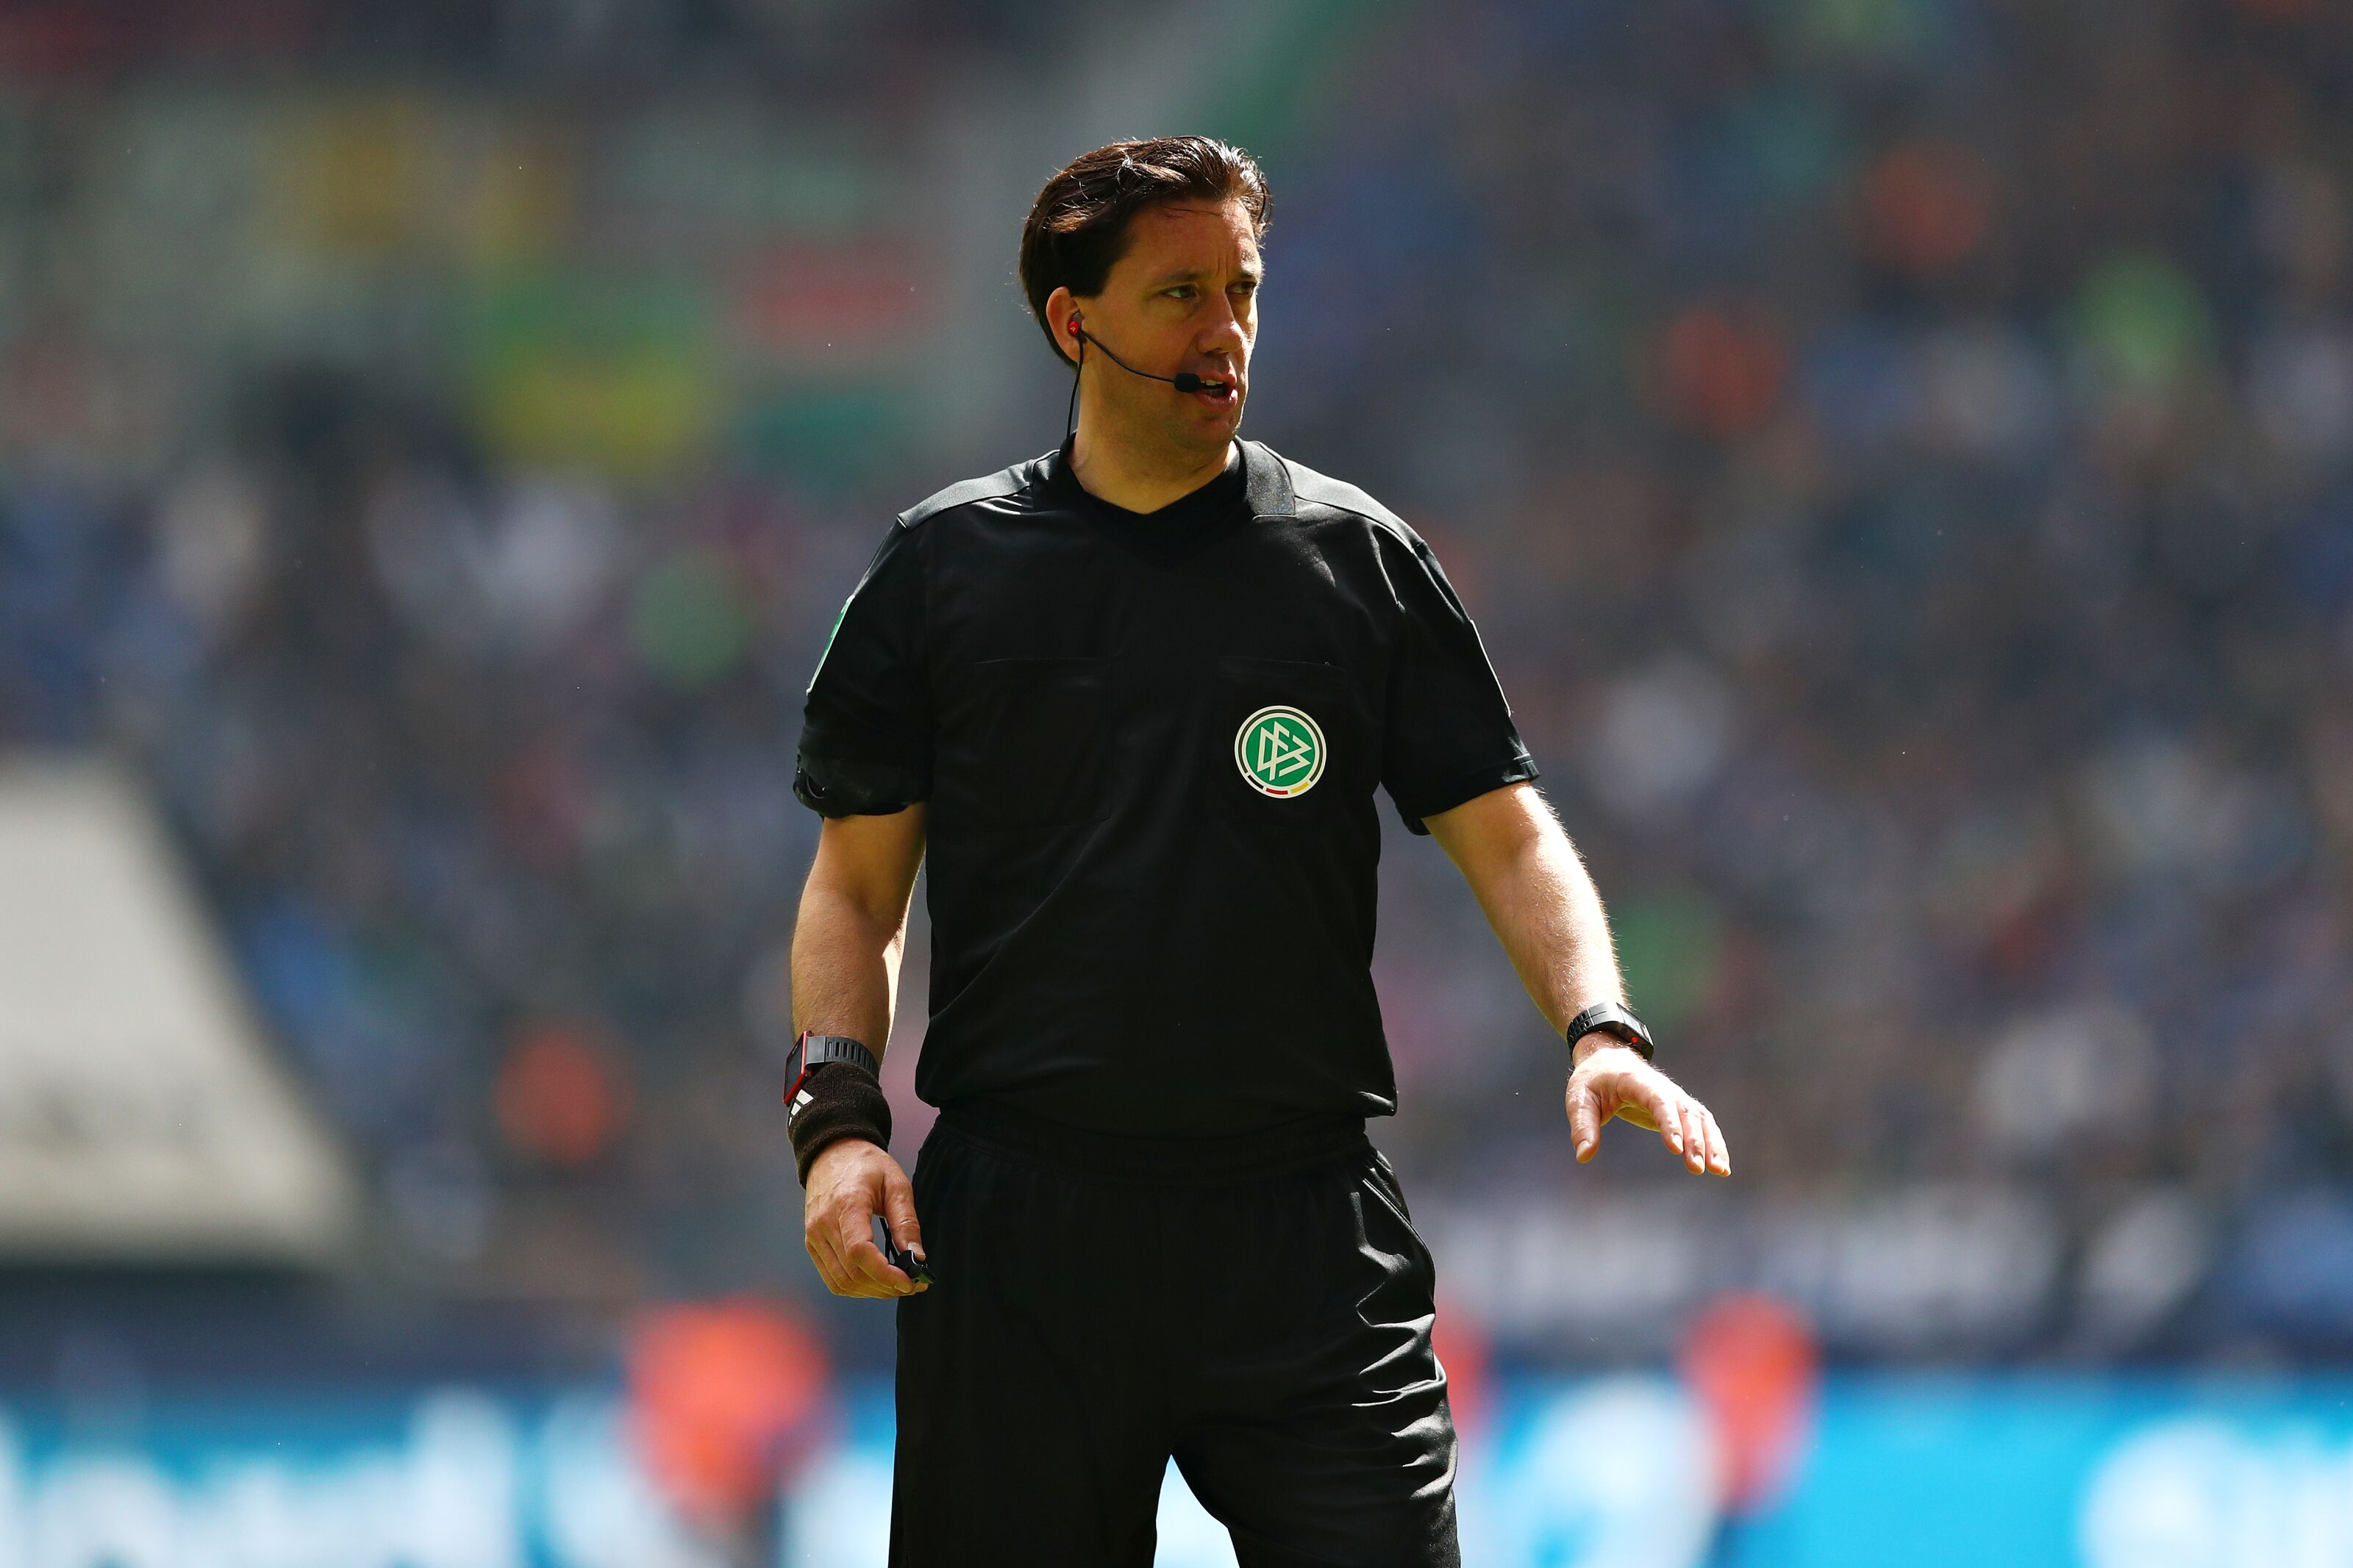 Rule changes heading into the 2019/2020 Bundesliga season